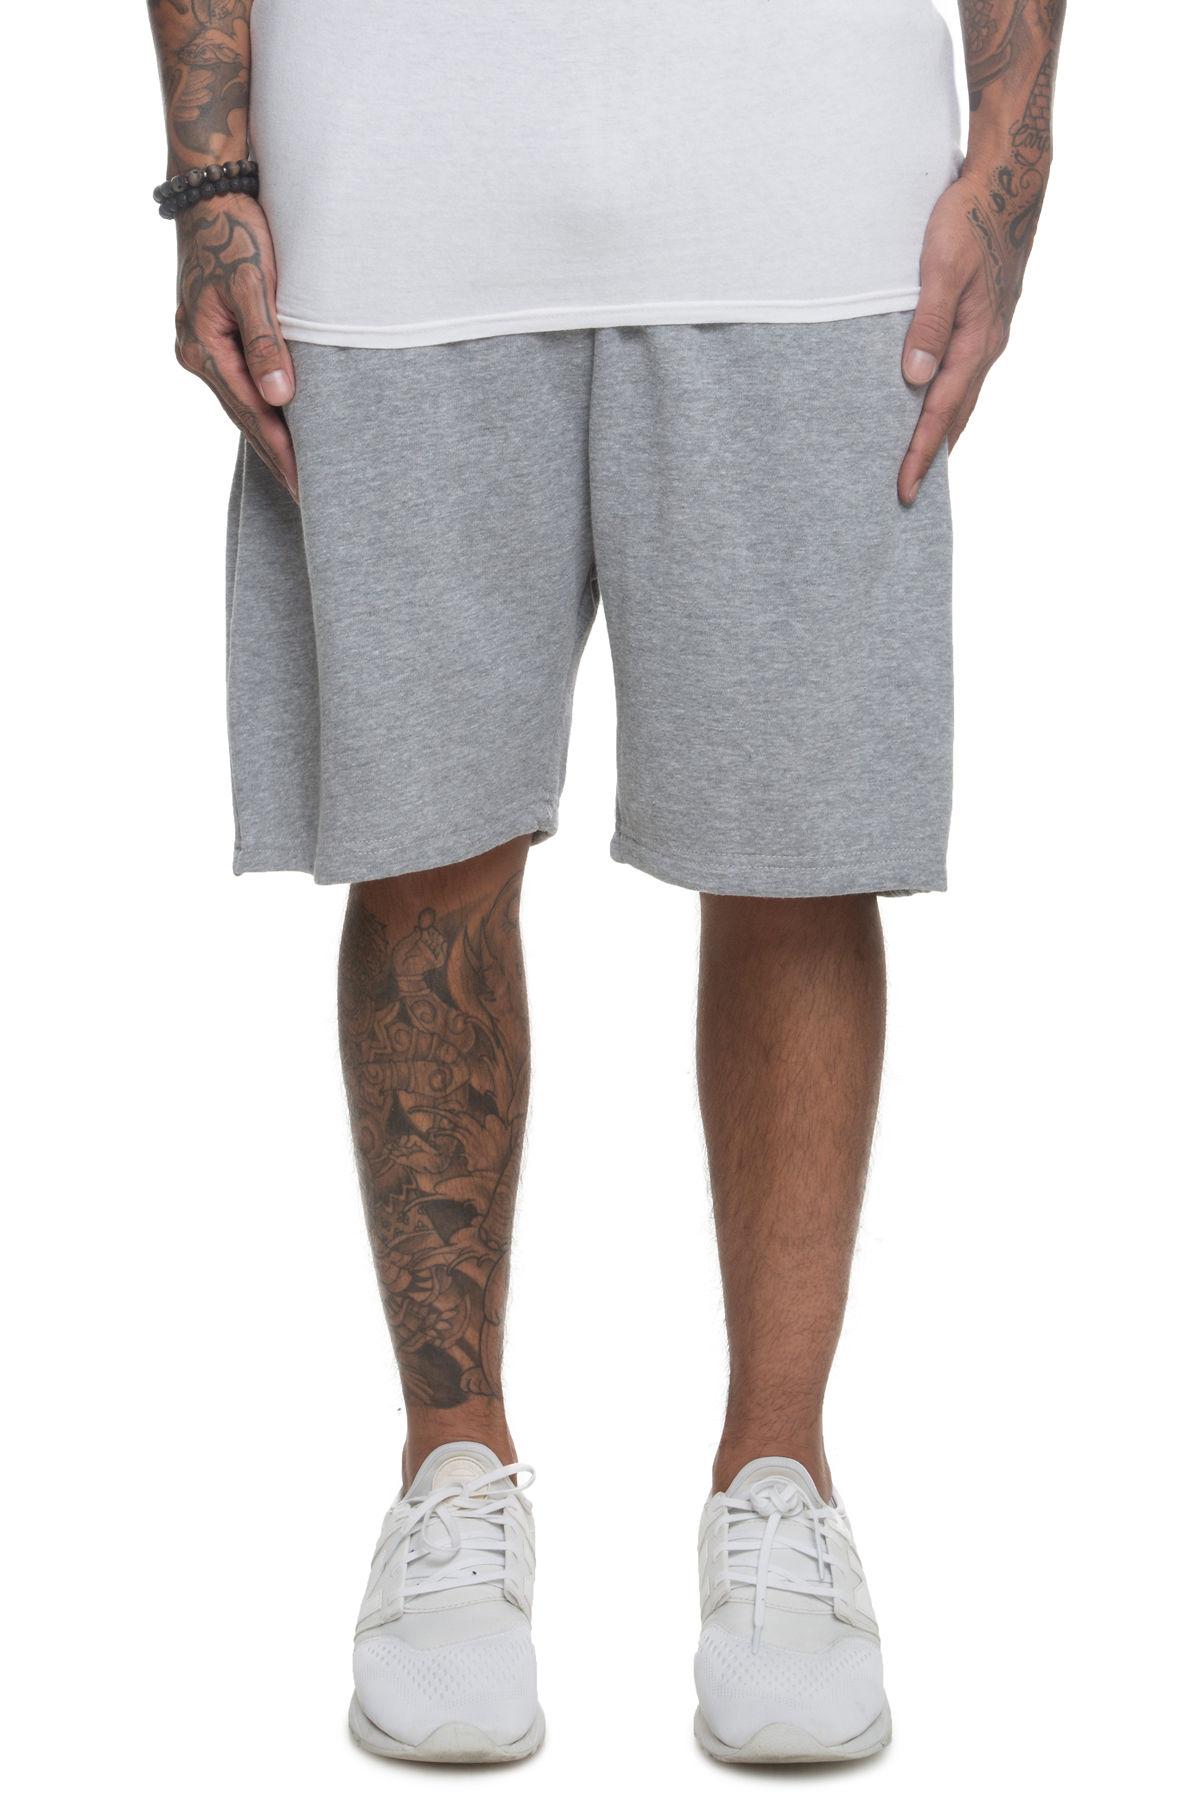 R/V Sweatsuit Shorts